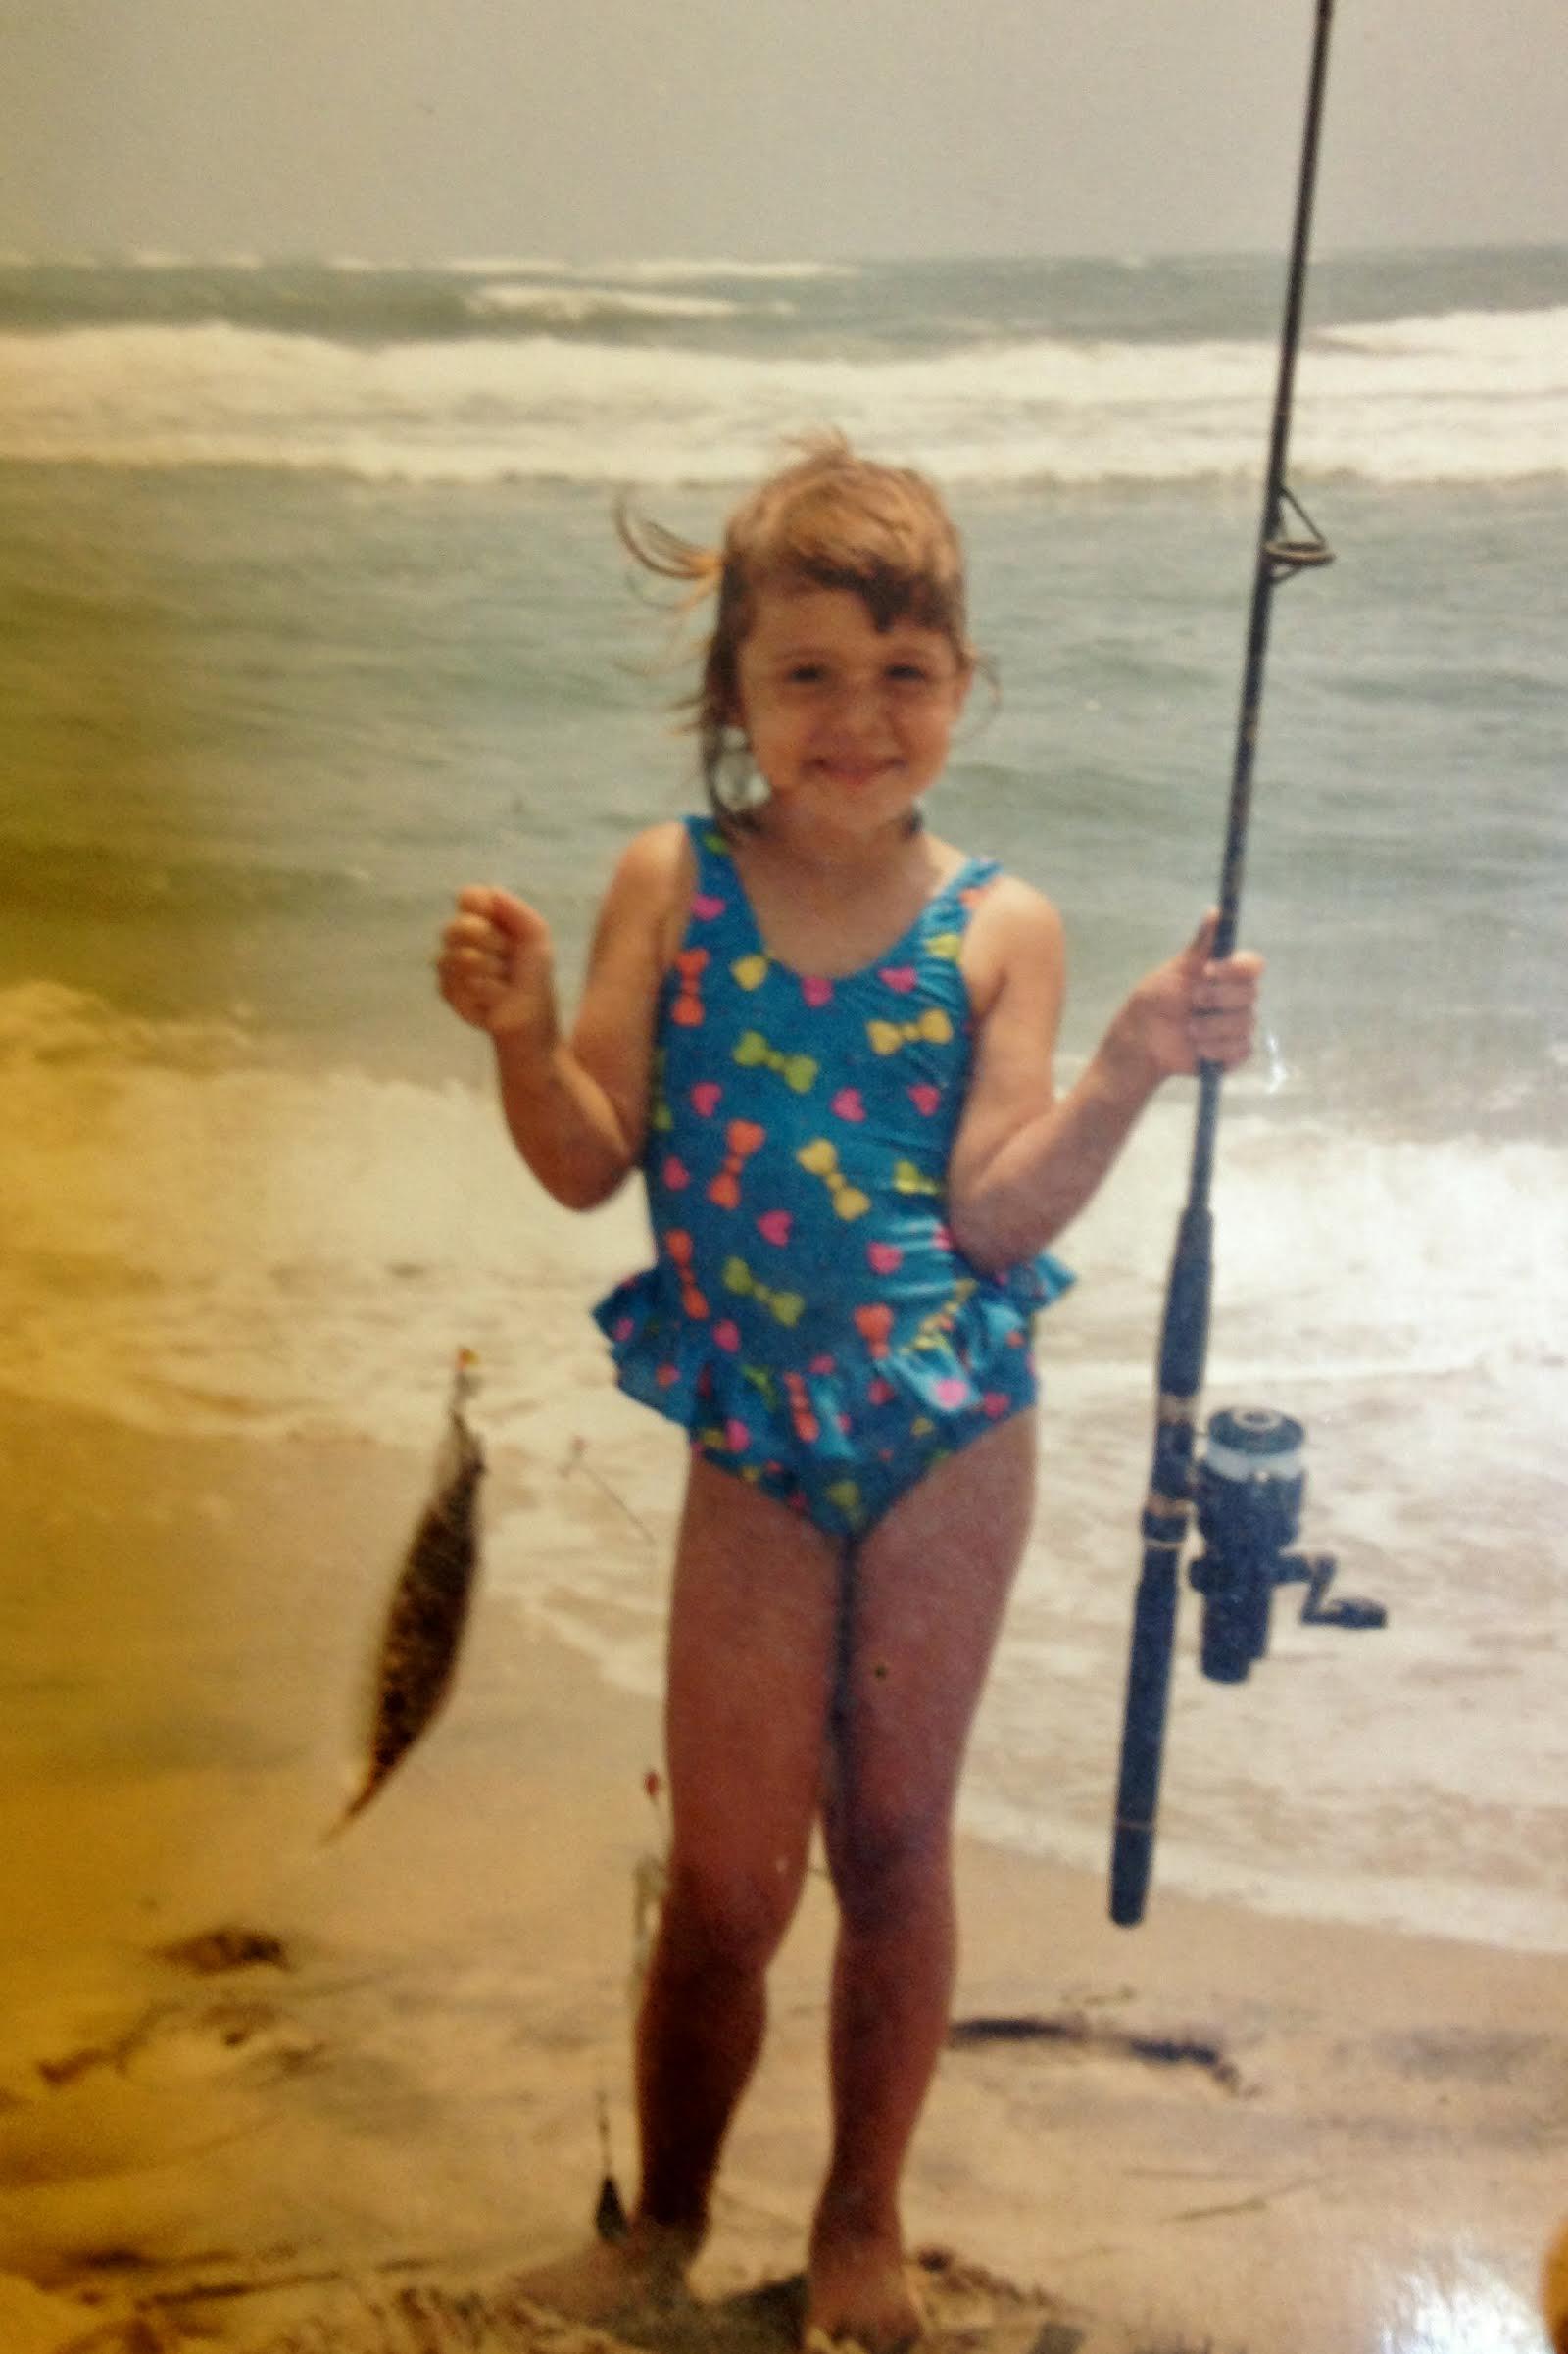 fishingkid